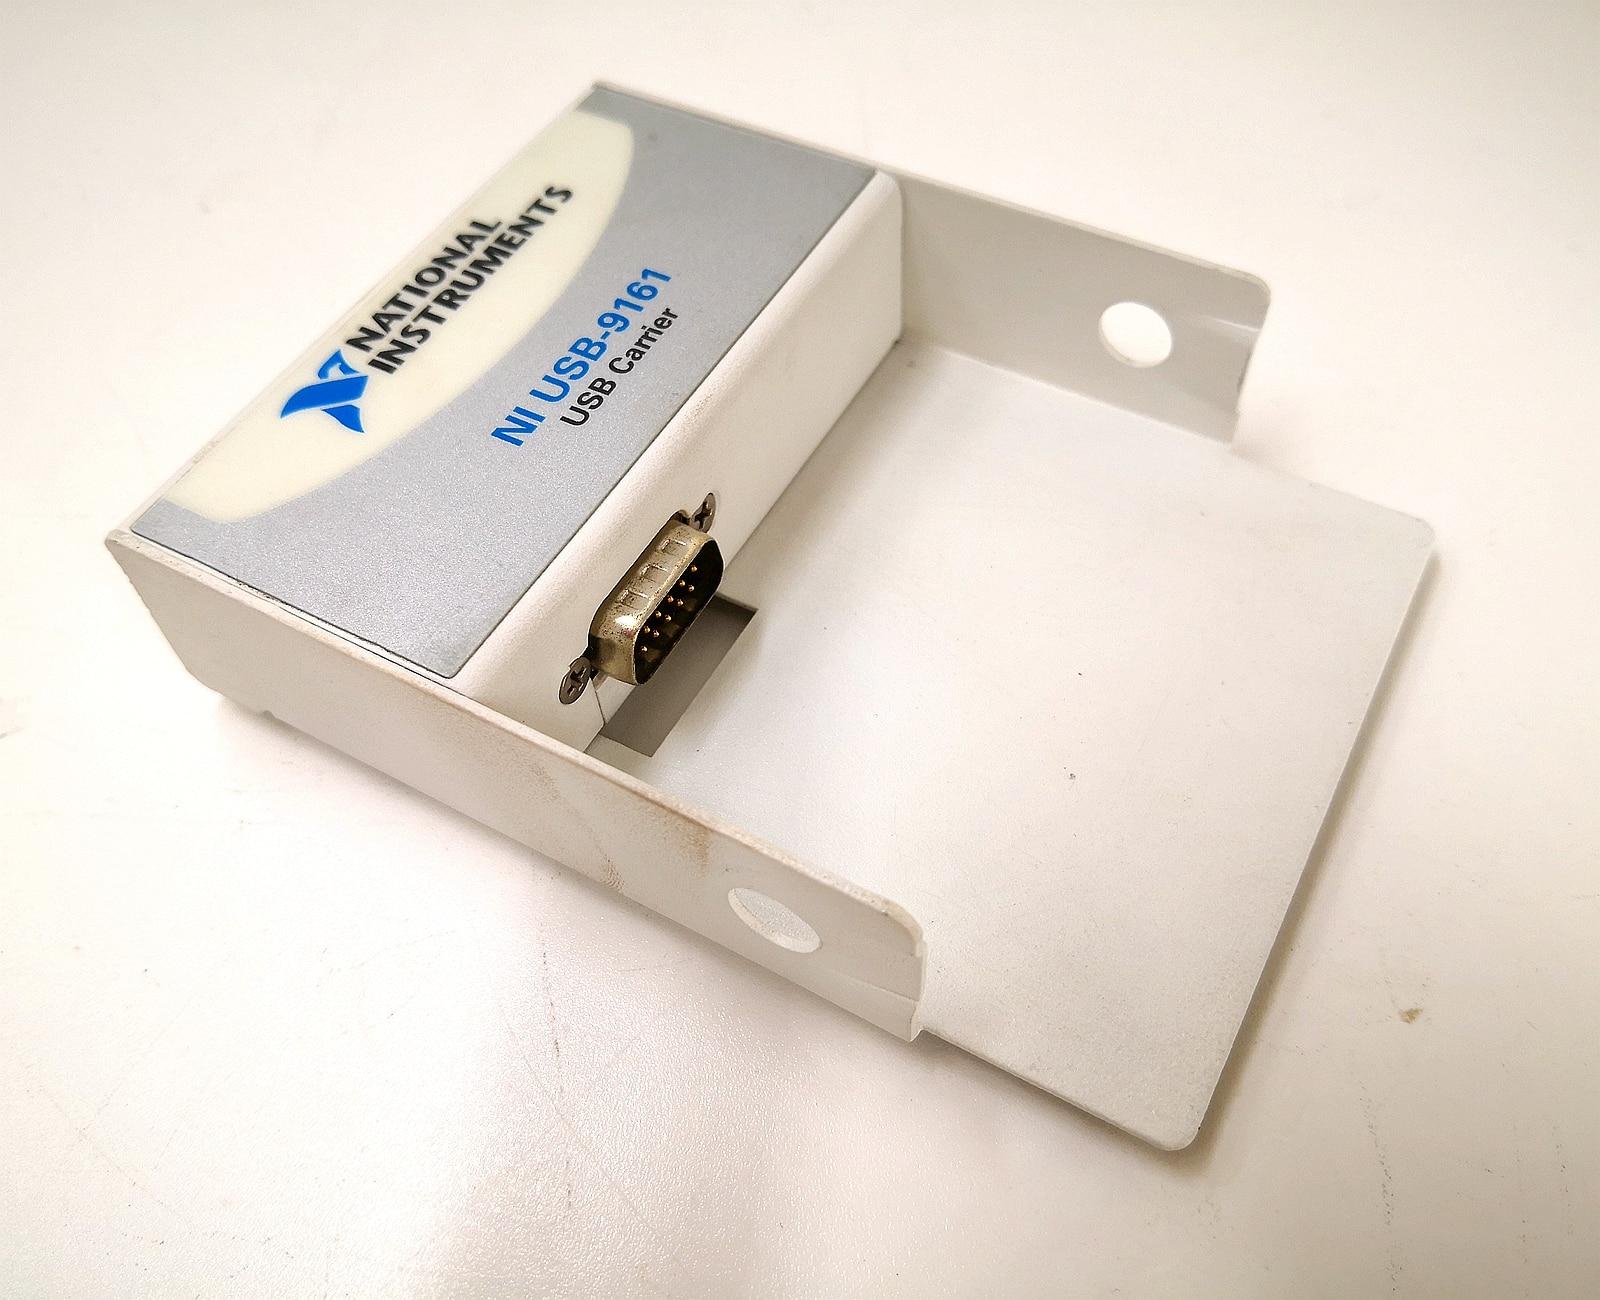 ني USB-9161